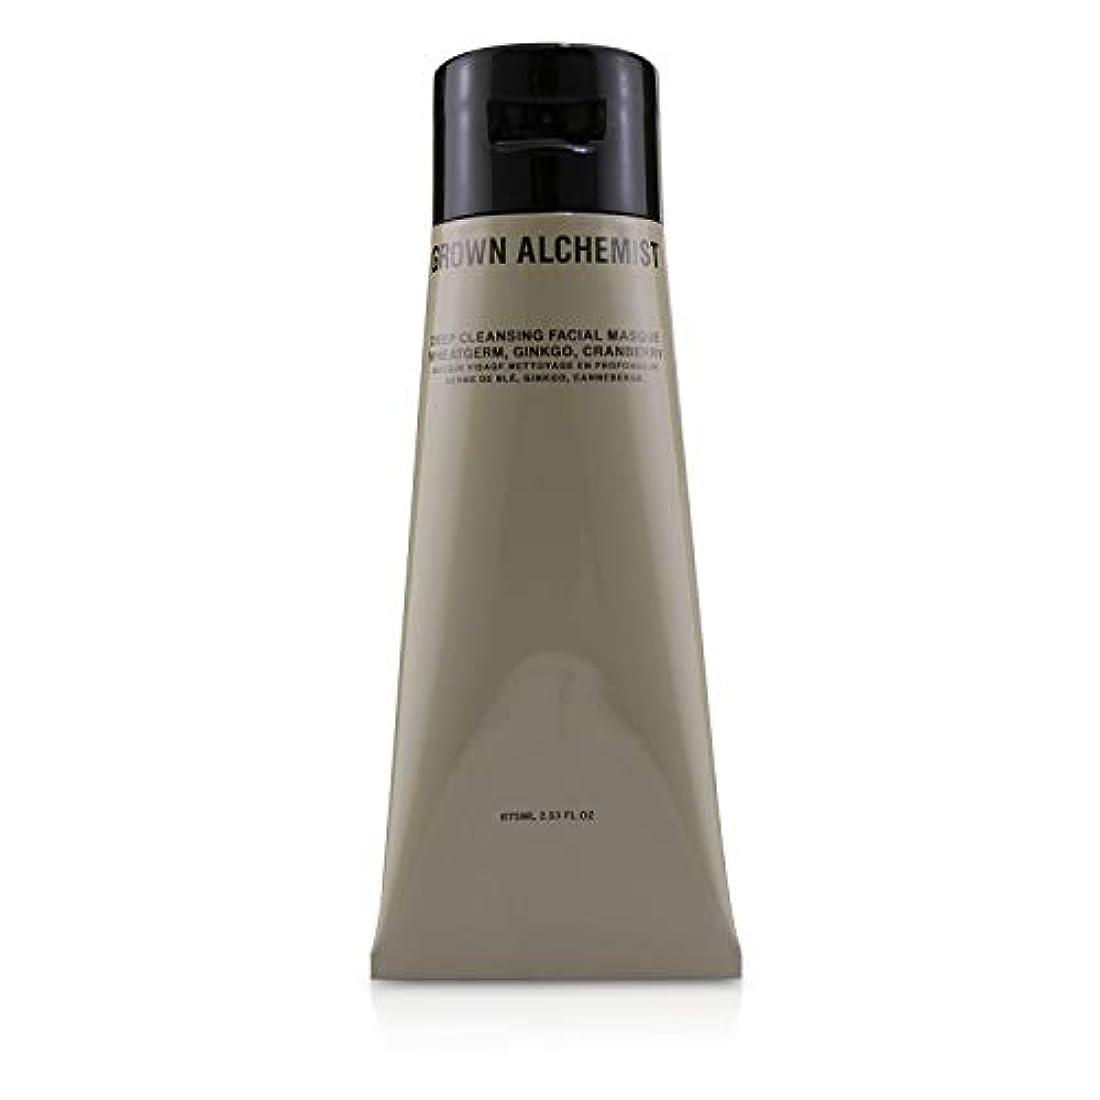 Grown Alchemist Deep Cleansing Facial Masque - Wheatgerm, Ginkgo & Cranberry 75ml/2.53oz並行輸入品